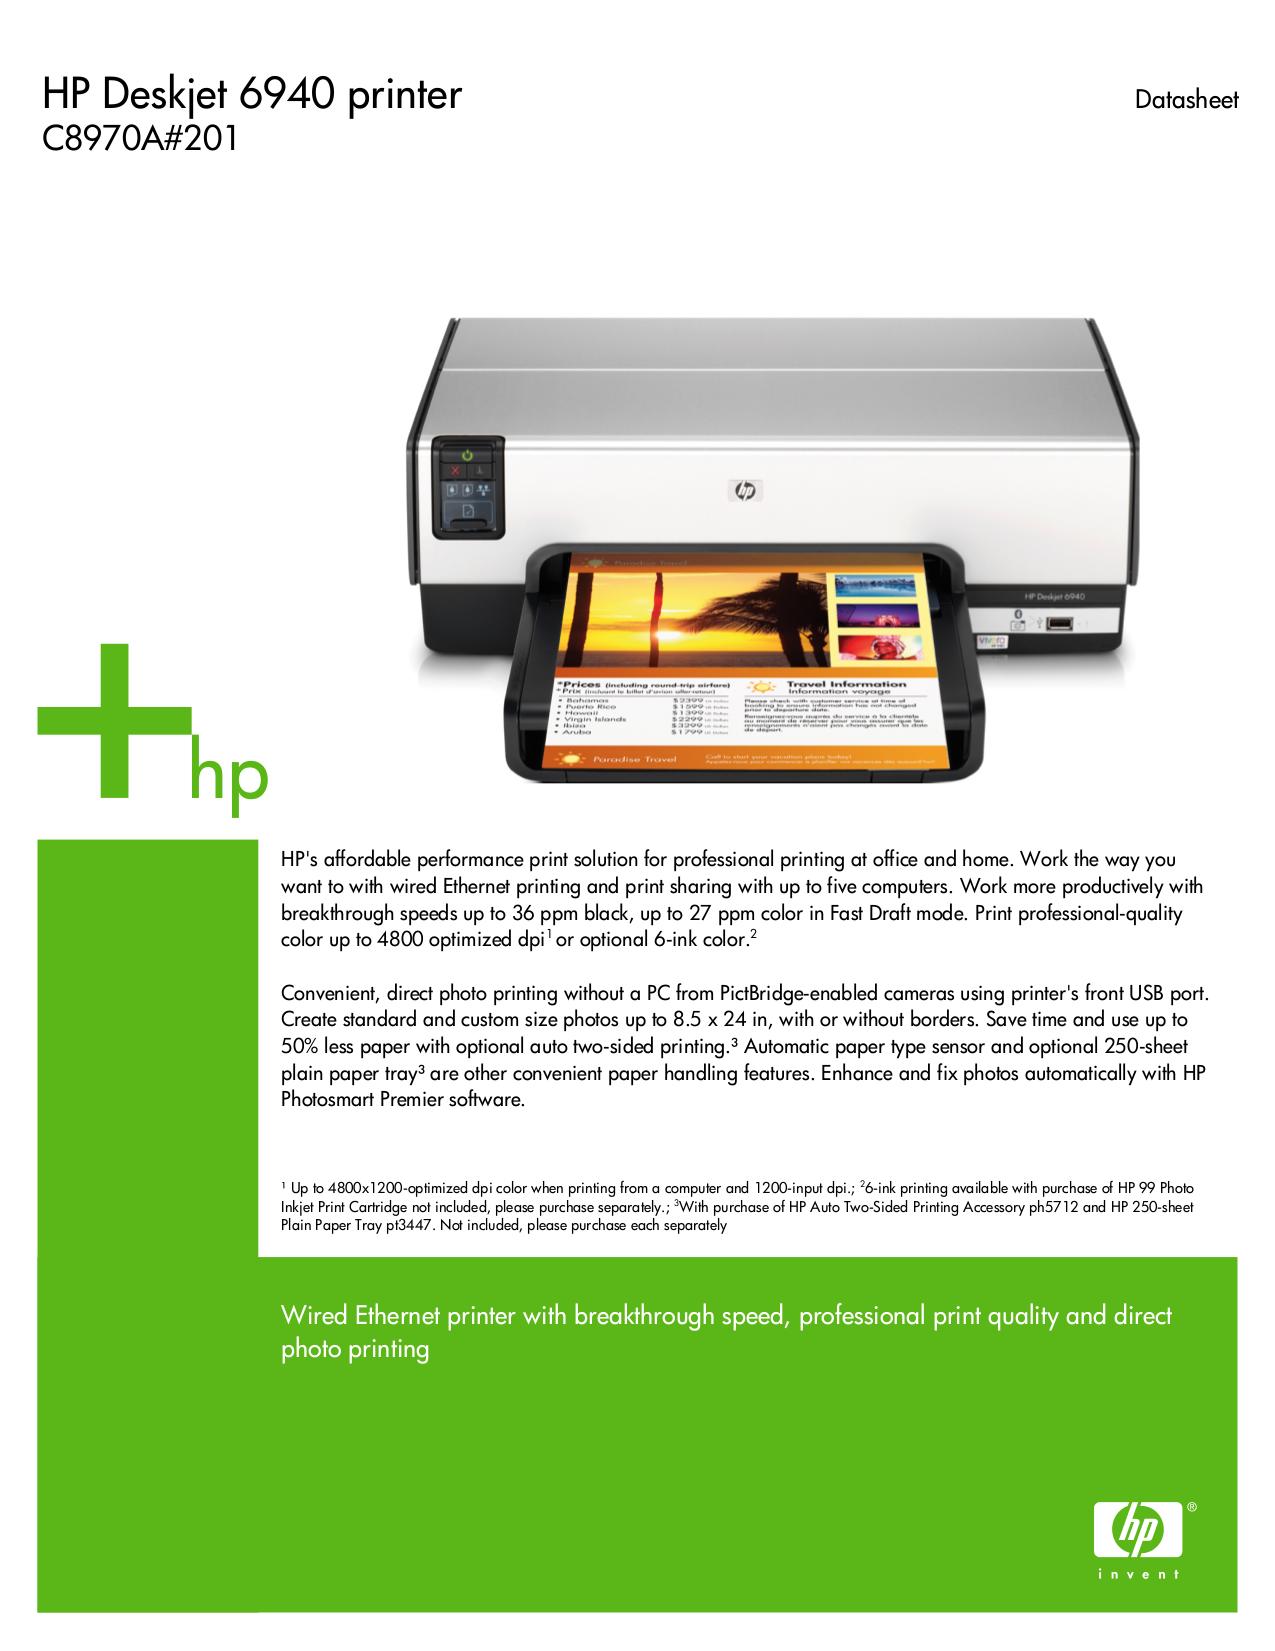 download free pdf for hp deskjet 6940 printer manual rh umlib com hp deskjet 6940 user manual HP Officejet 4500